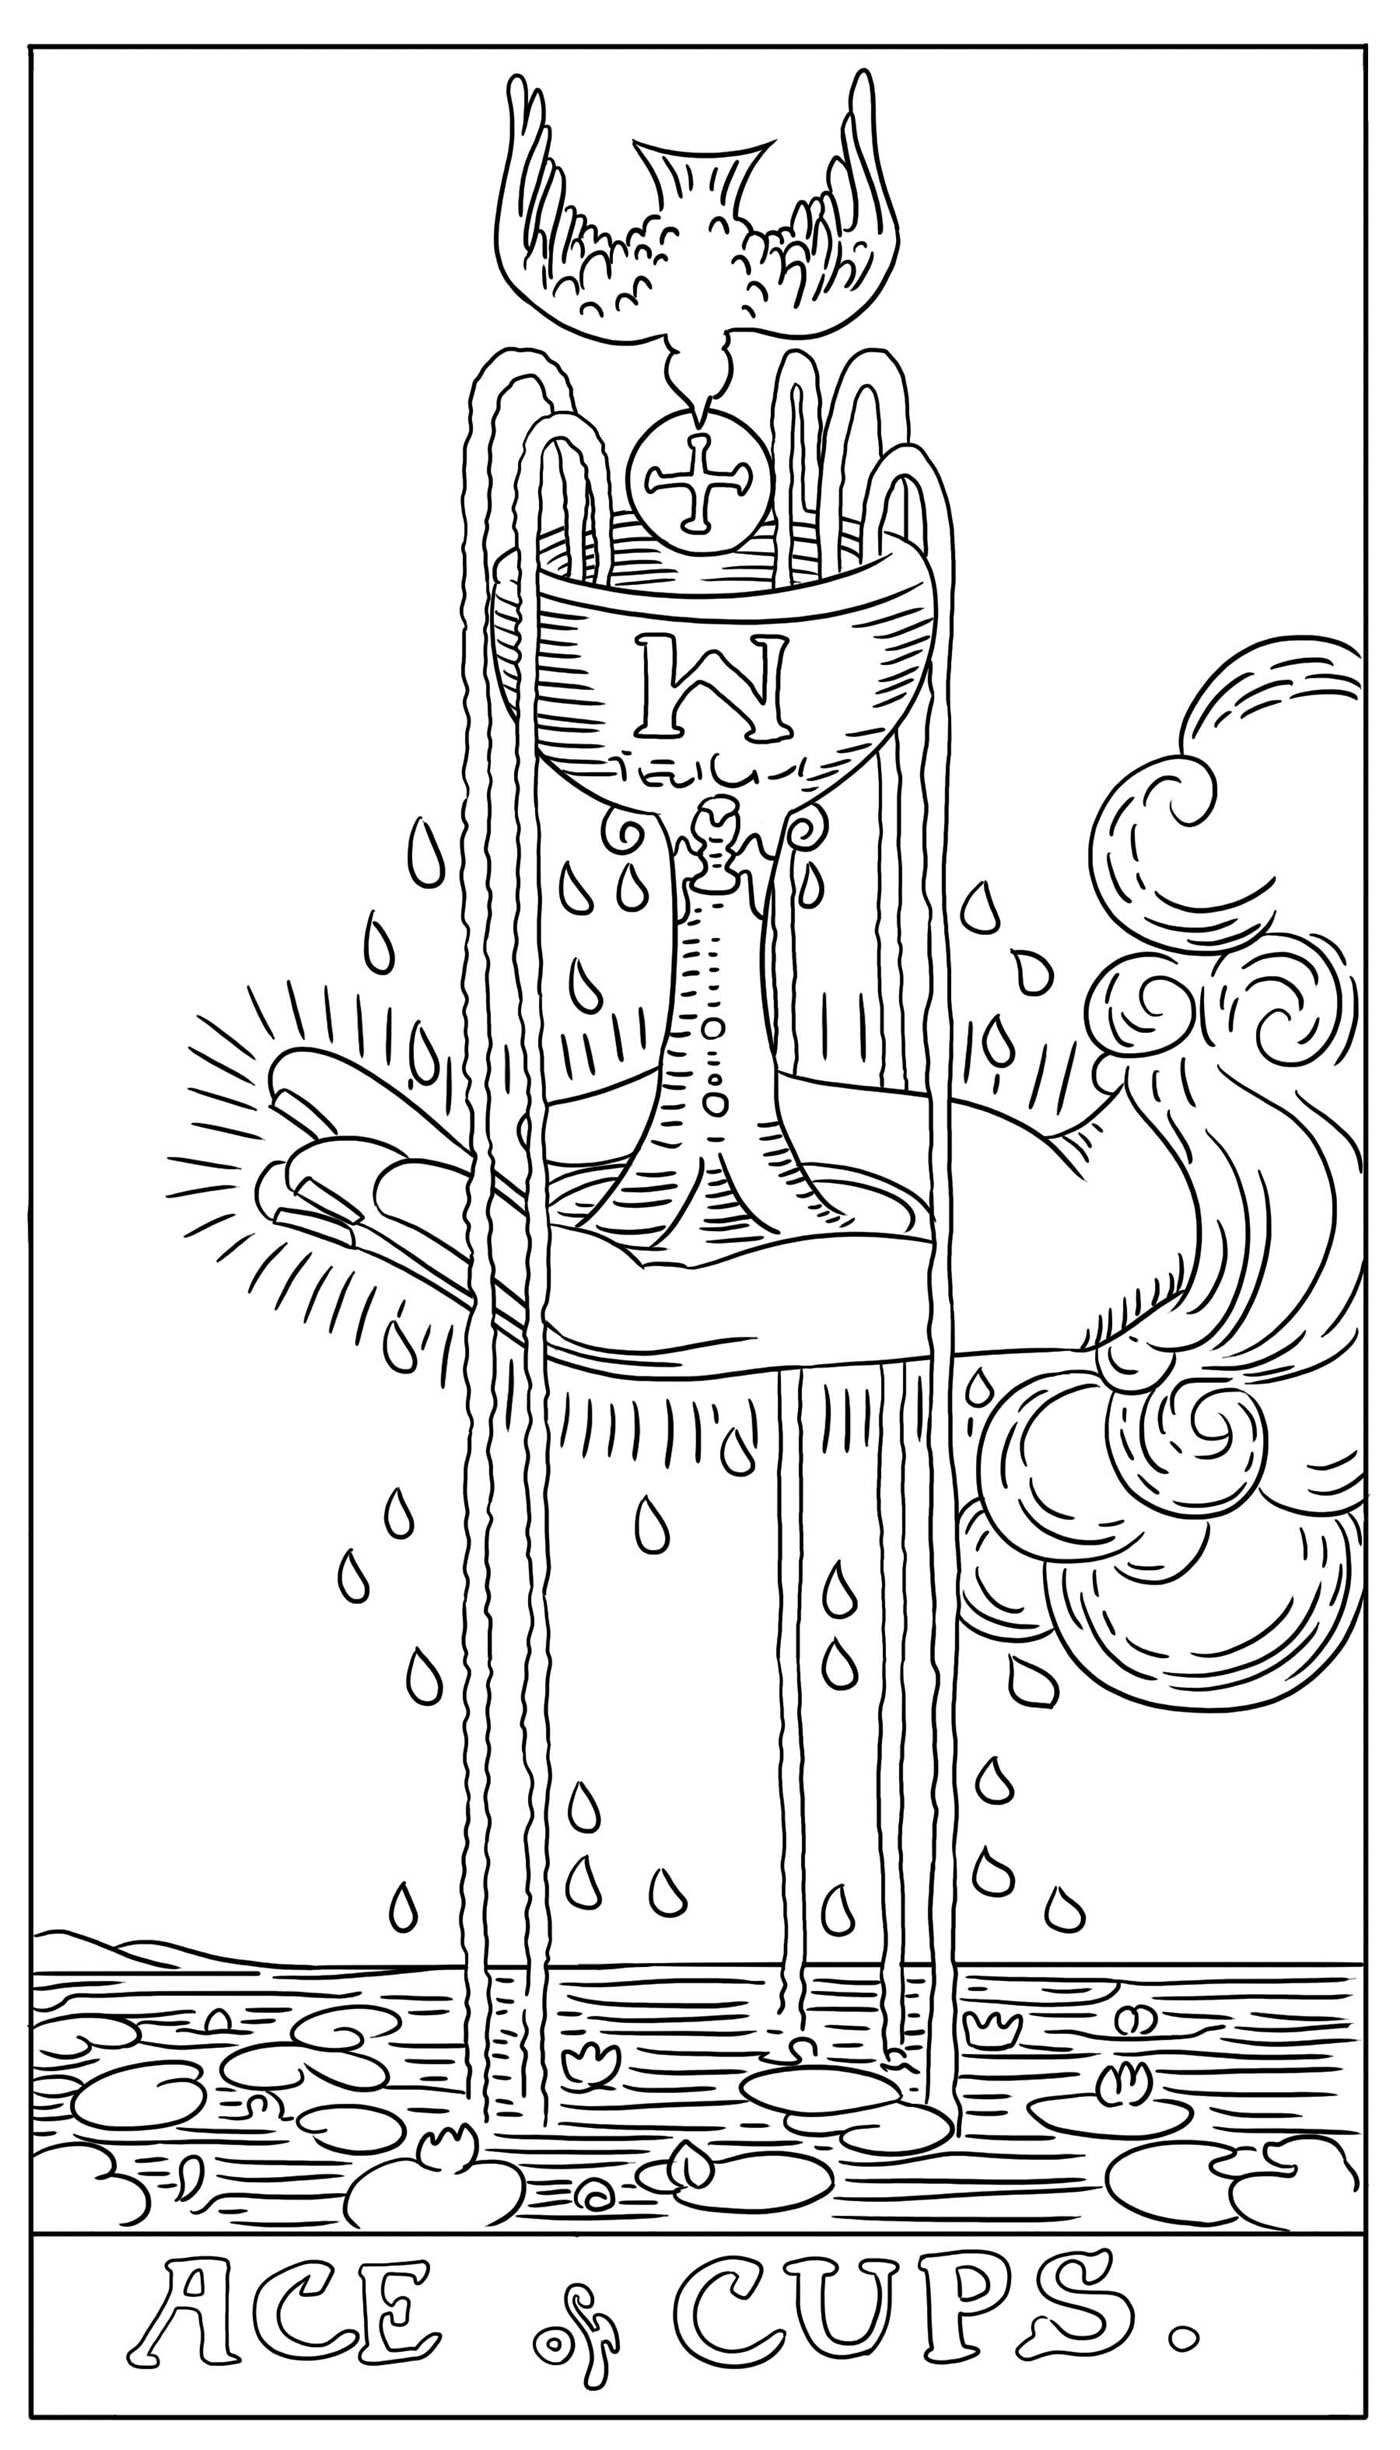 81yukensr4l Jpg 1400 2450 Pentacles Tarot Cups Tarot Tarot Cards Art